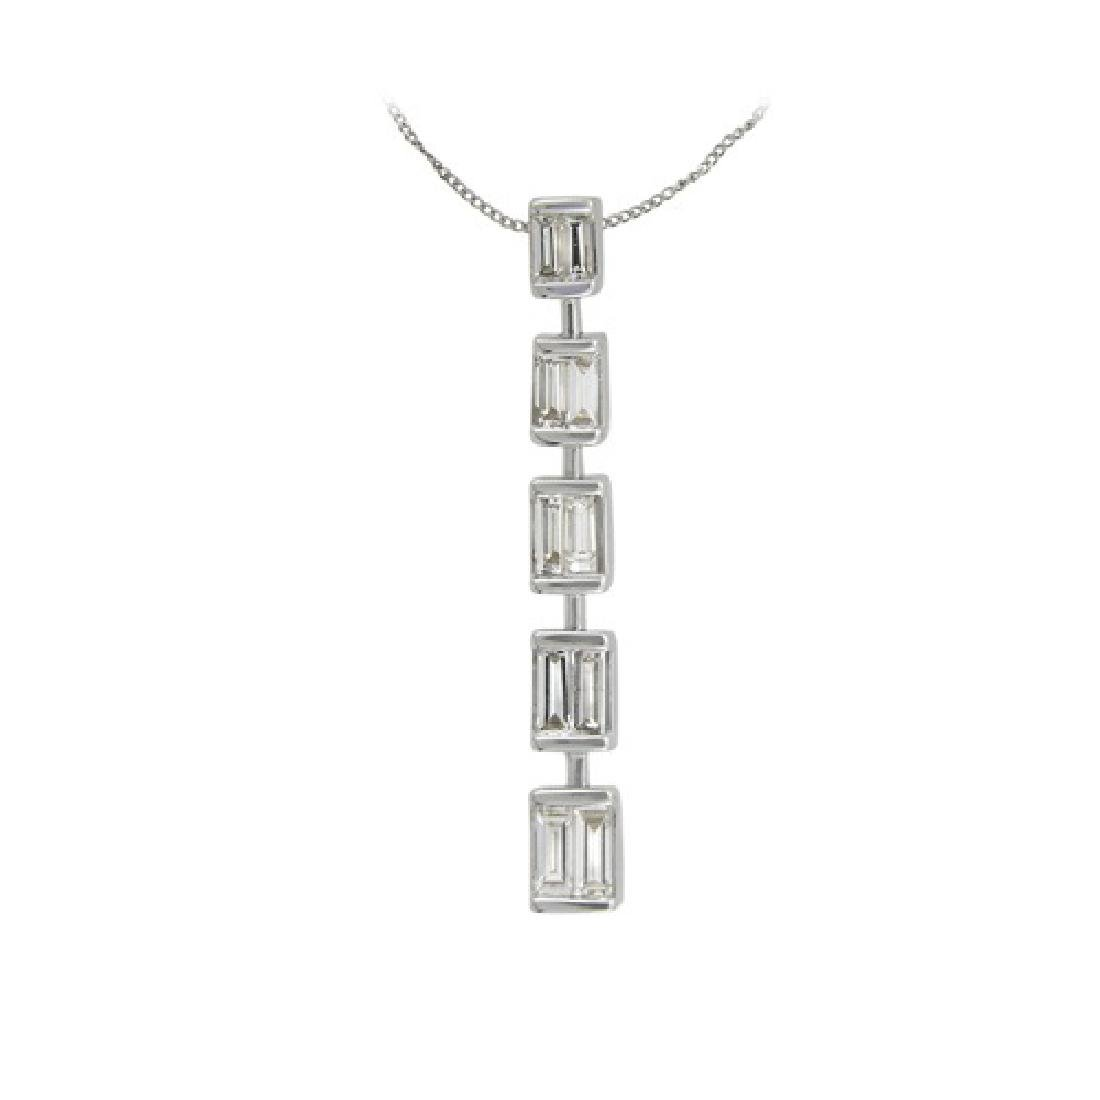 0.5 CTW 14K White Gold Ladies Slider with Chain